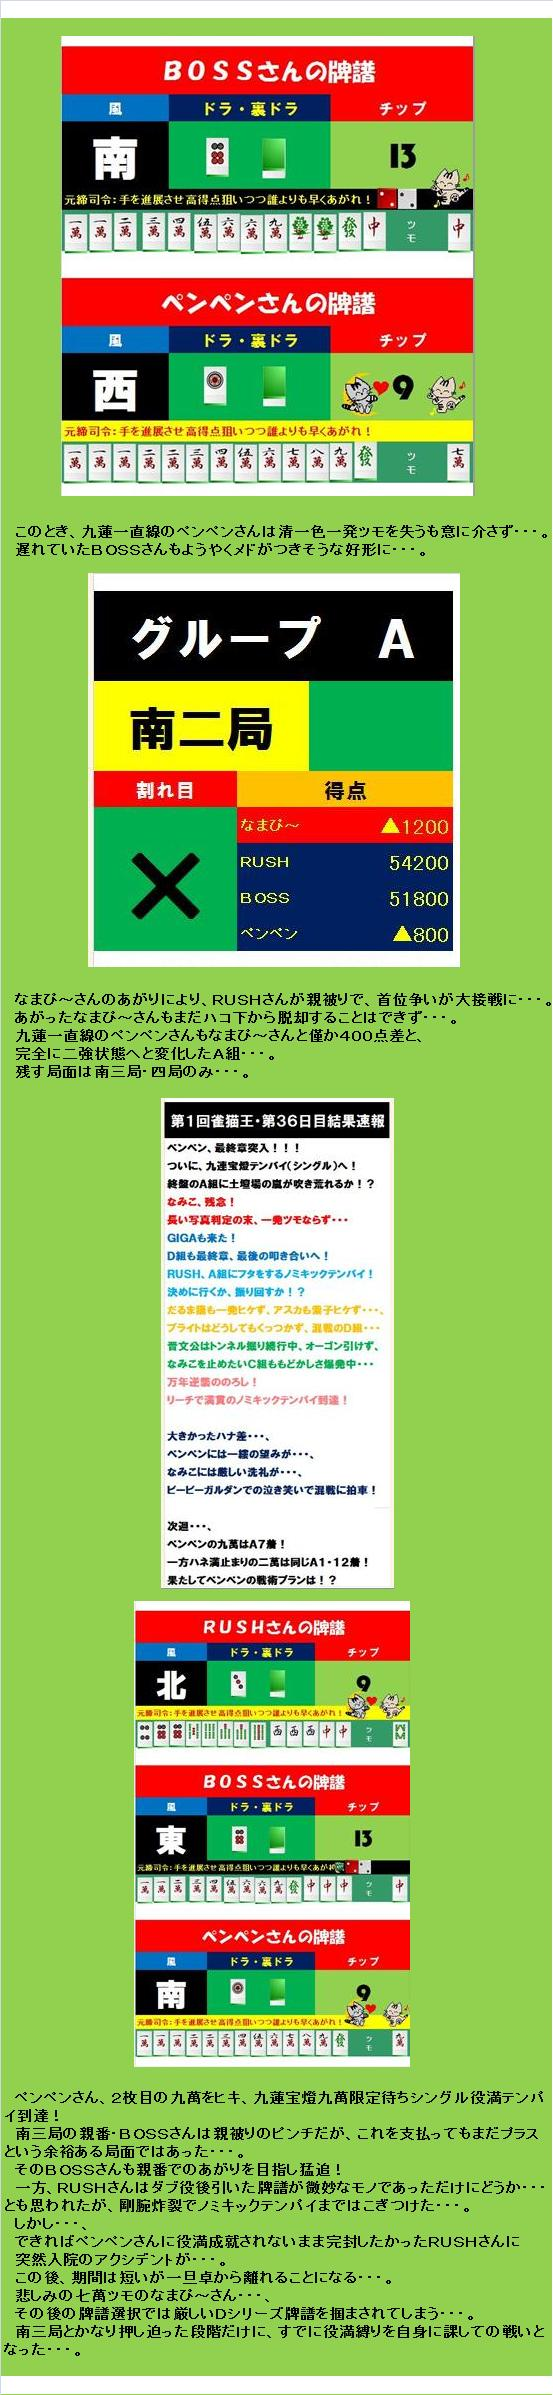 20100226・A組回顧17.jpg